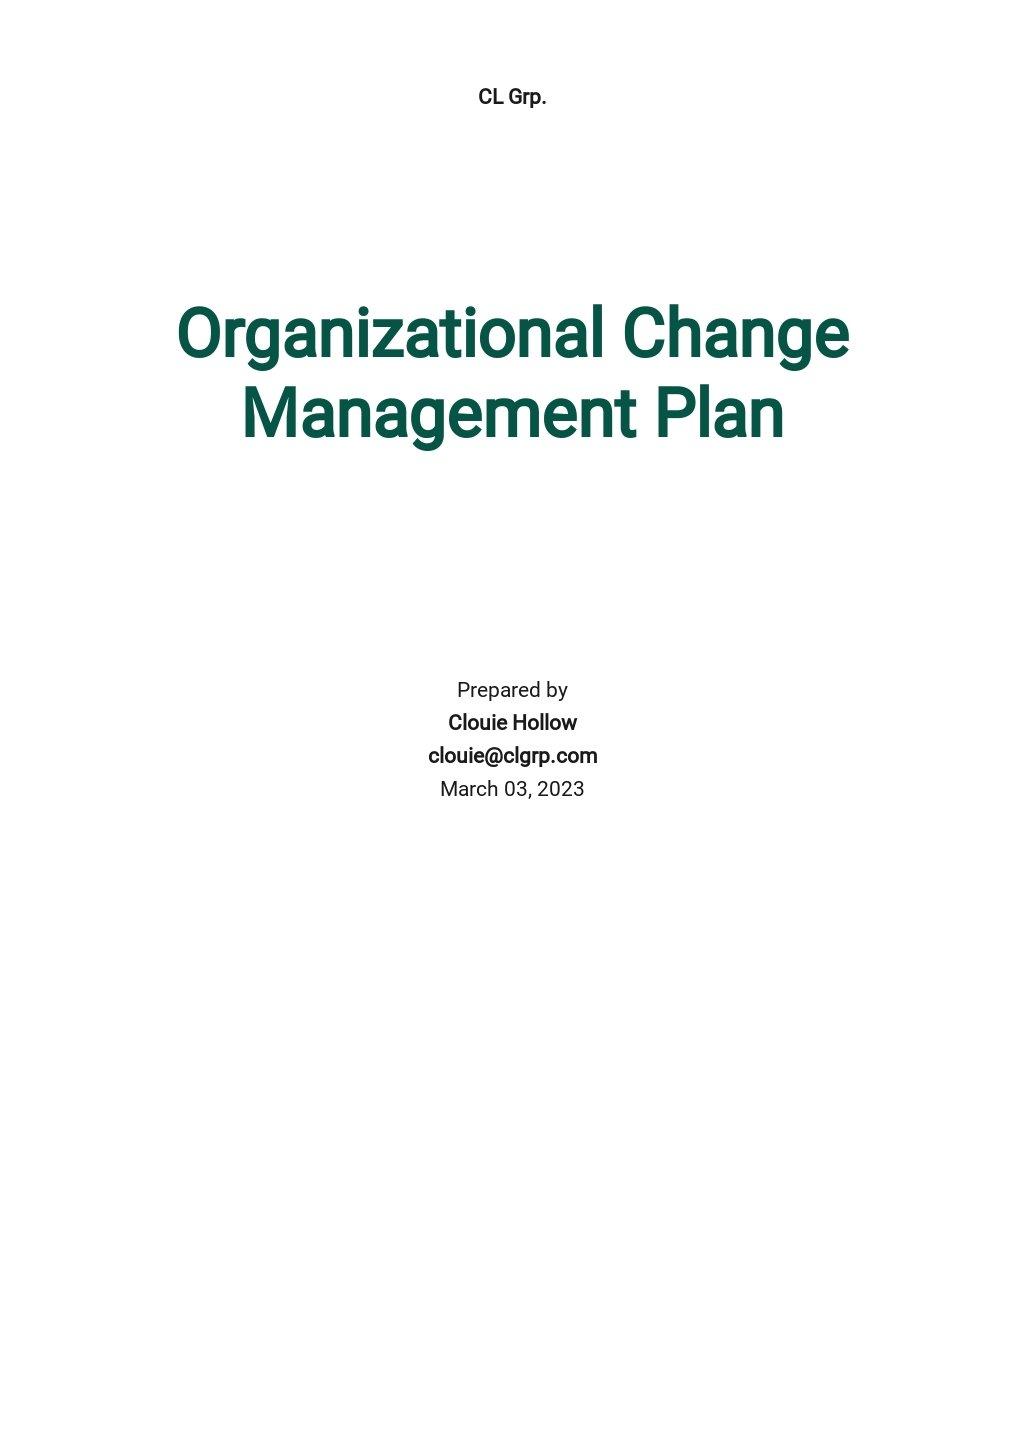 Organizational Change Management Plan Template.jpe